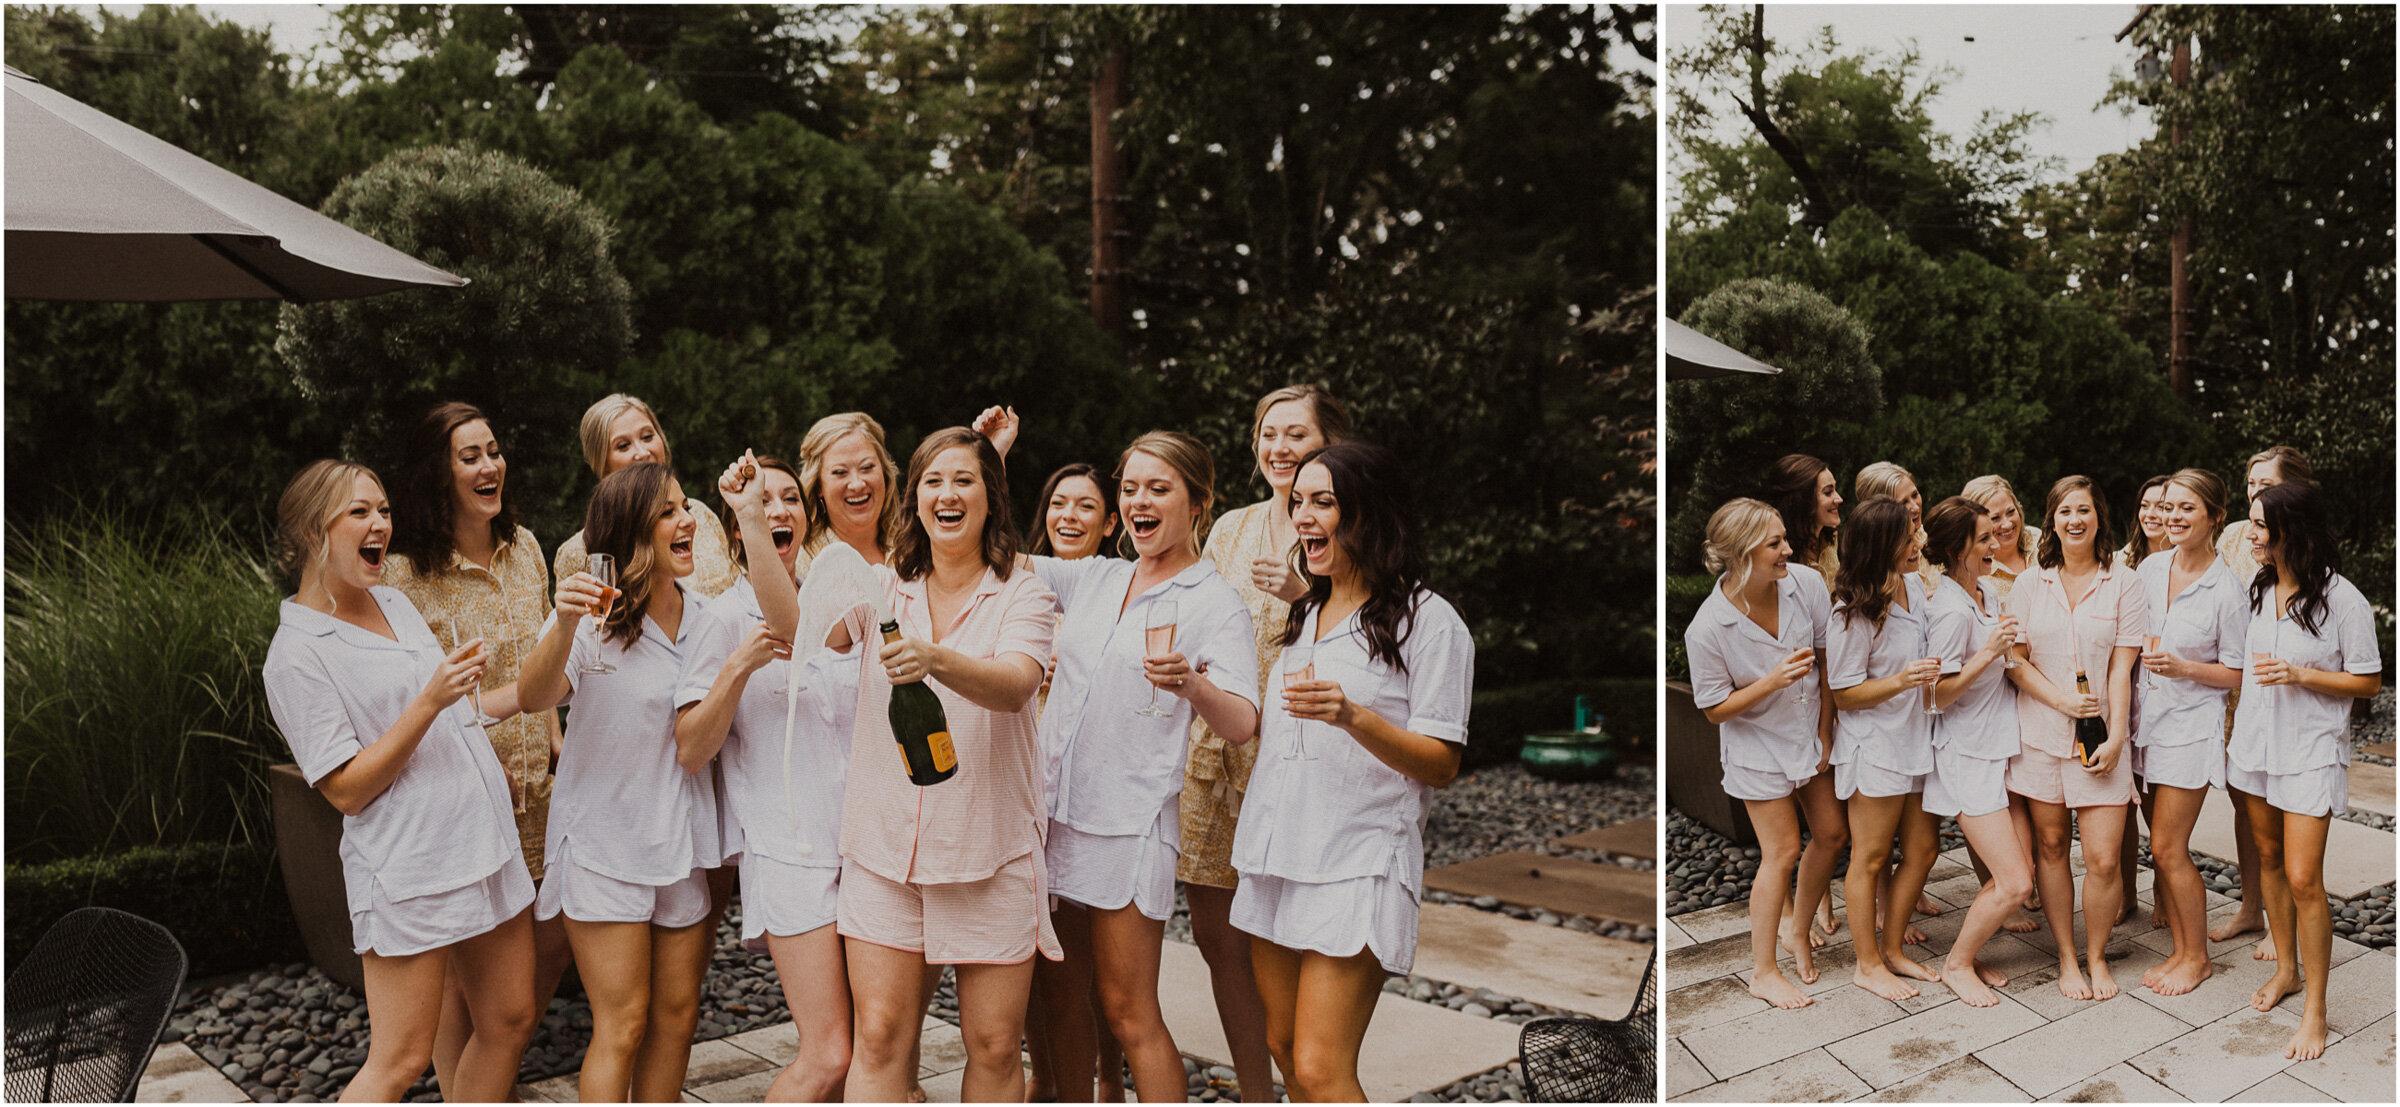 alyssa barletter photography the abbott kansas city summer wedding-4.jpg